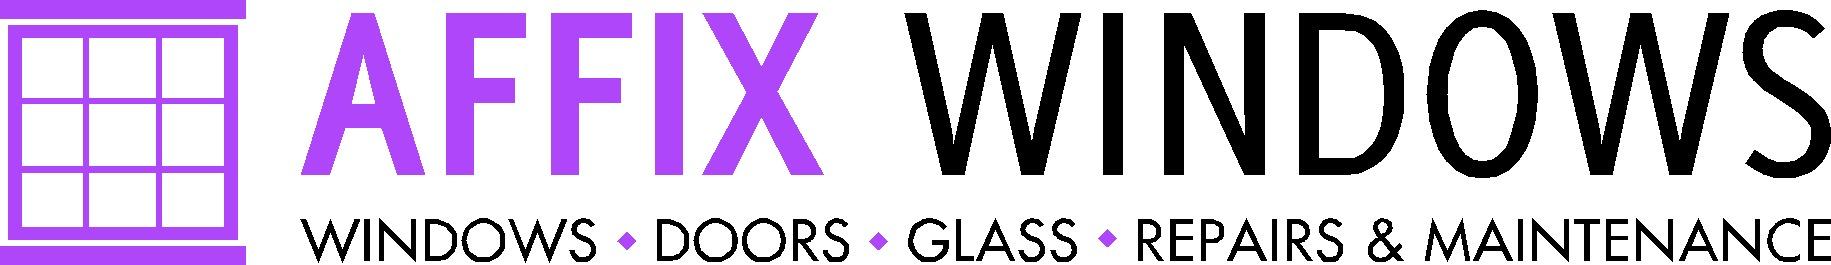 Affix Windows and Doors Ltd